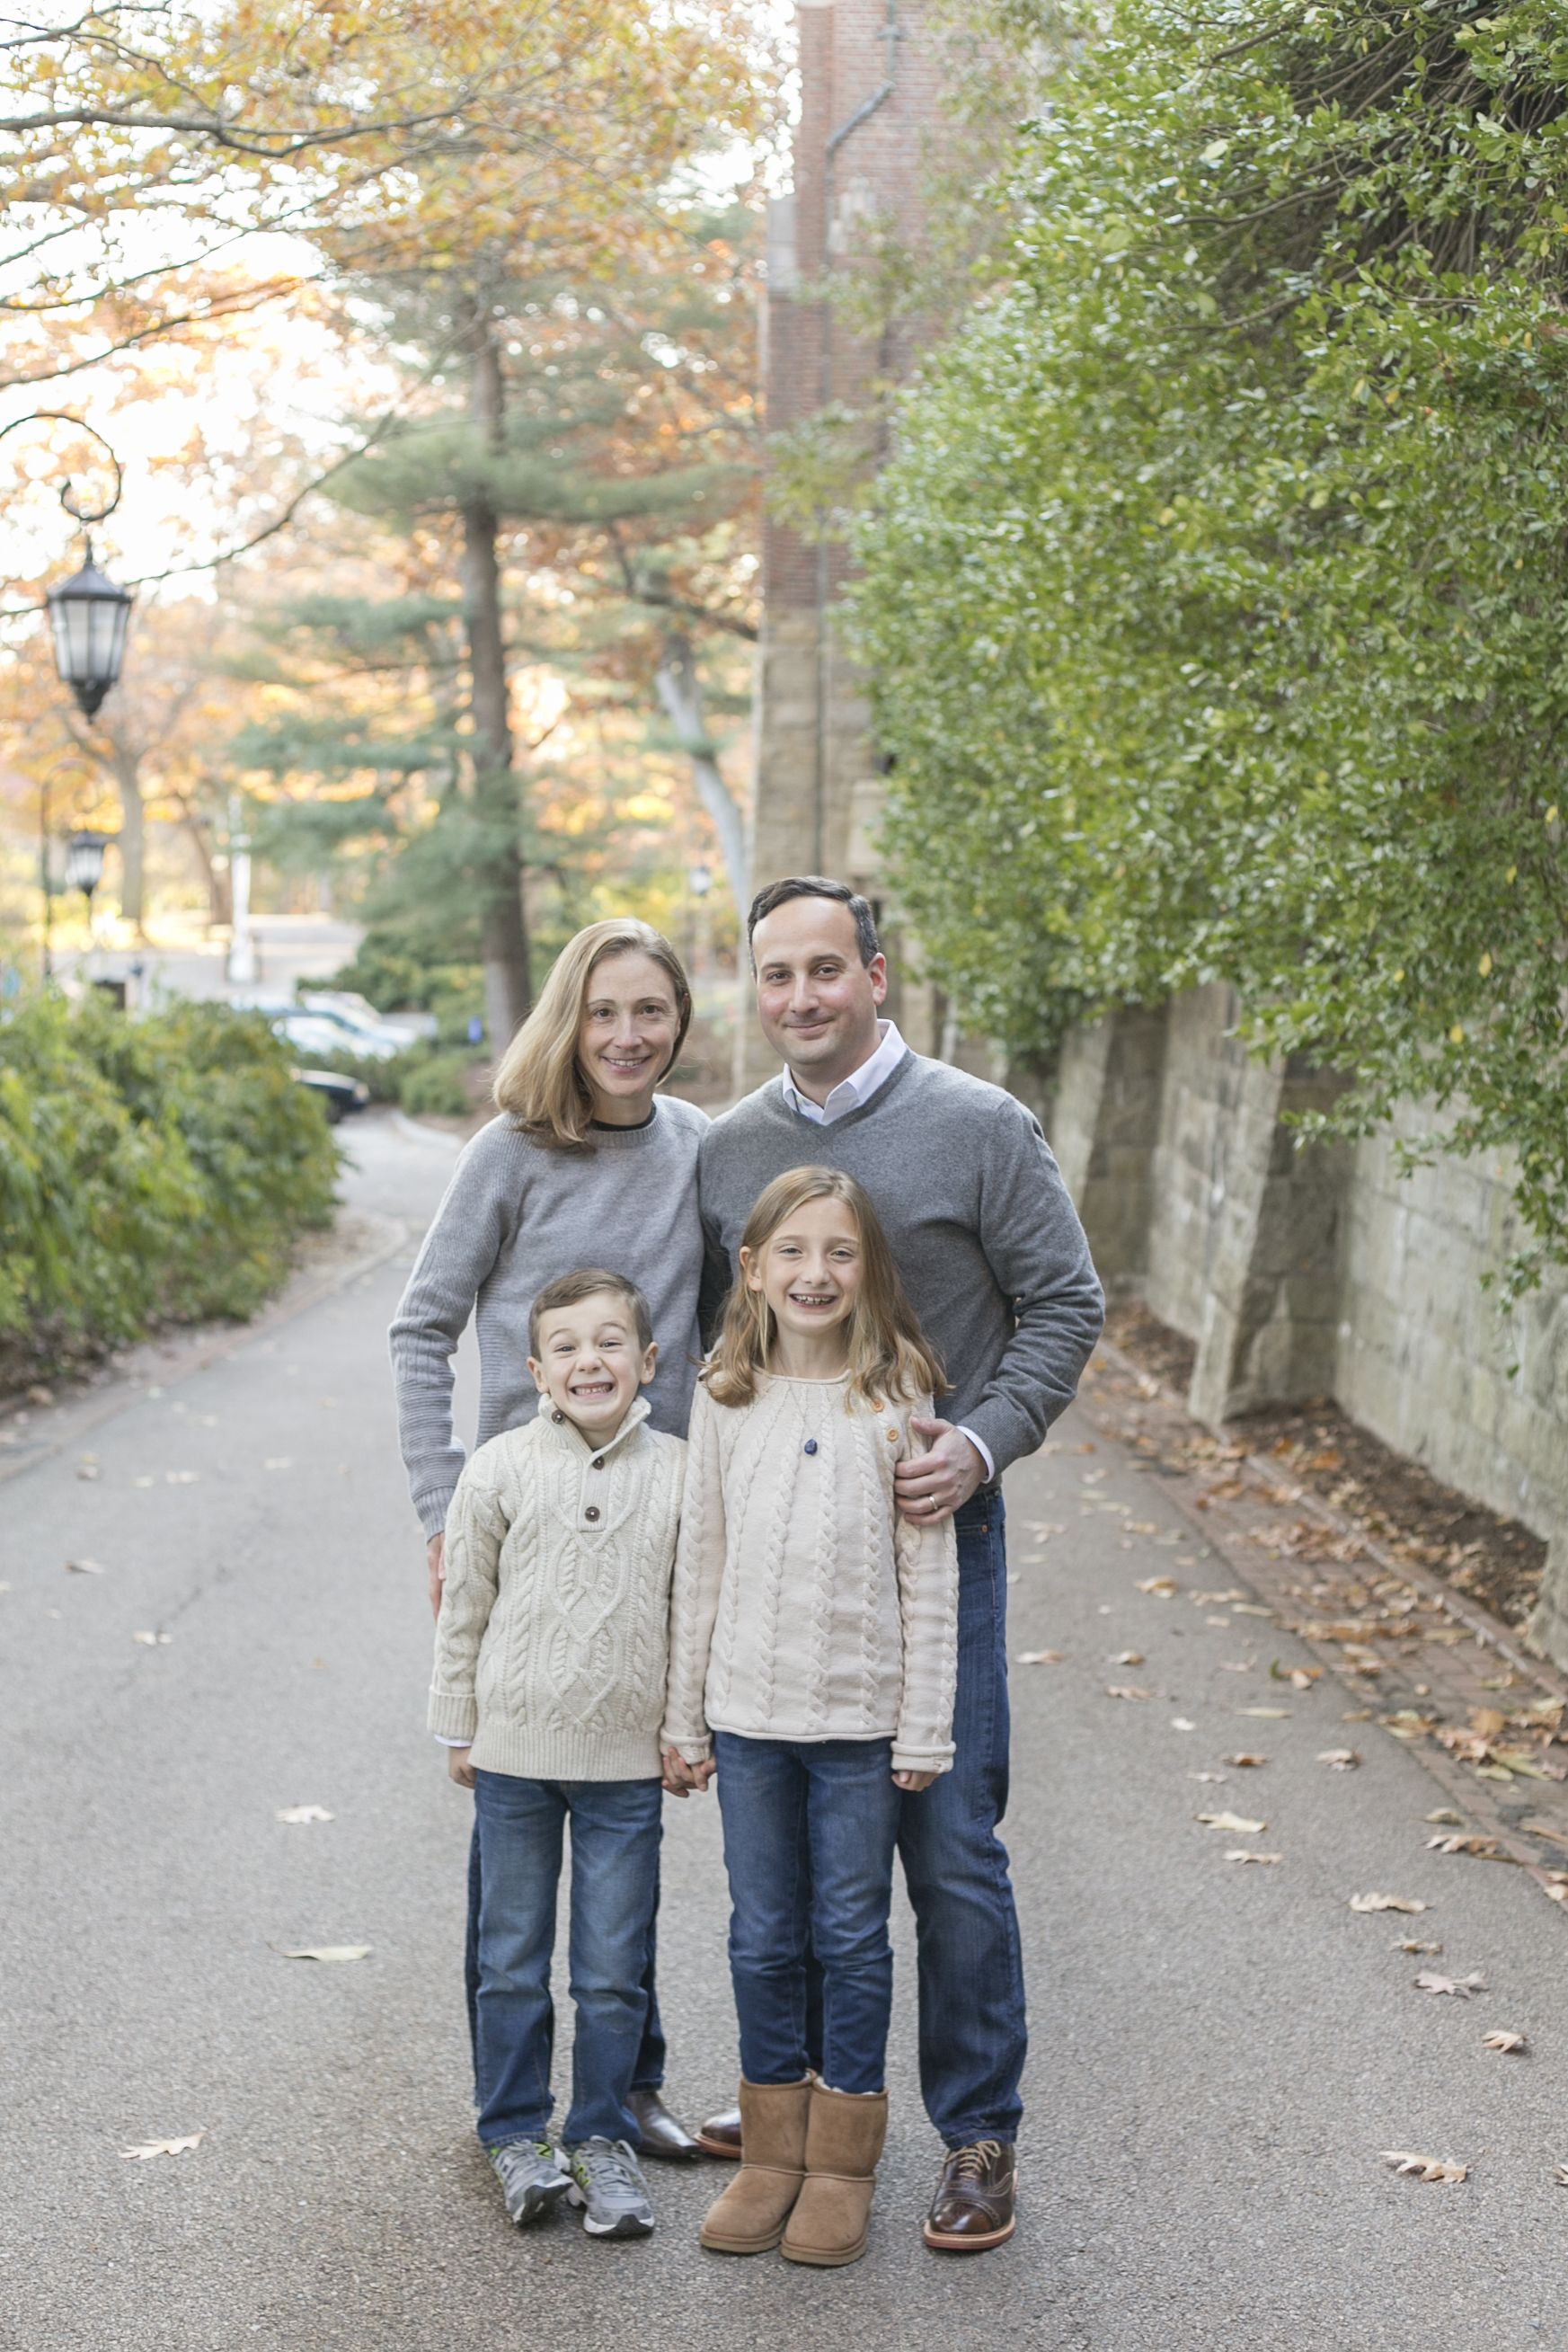 wellesley family fall photos  Boston, wellesley